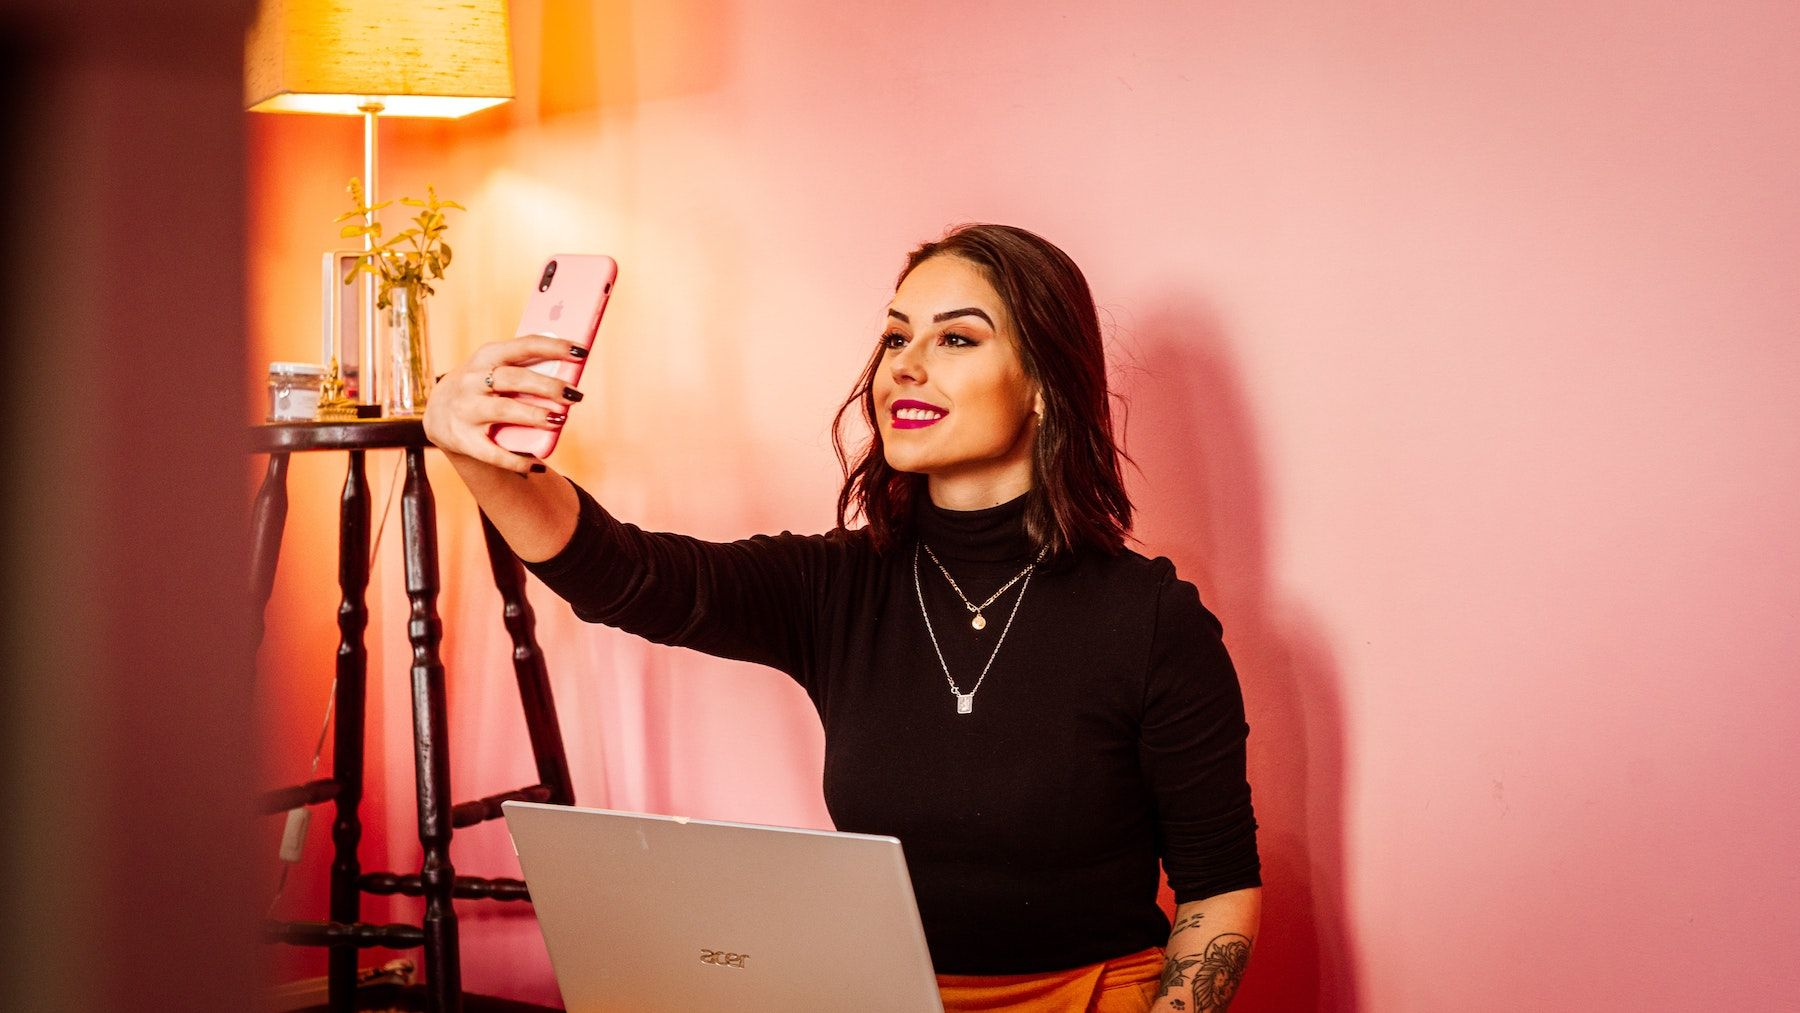 Beauty Instagram Influencer